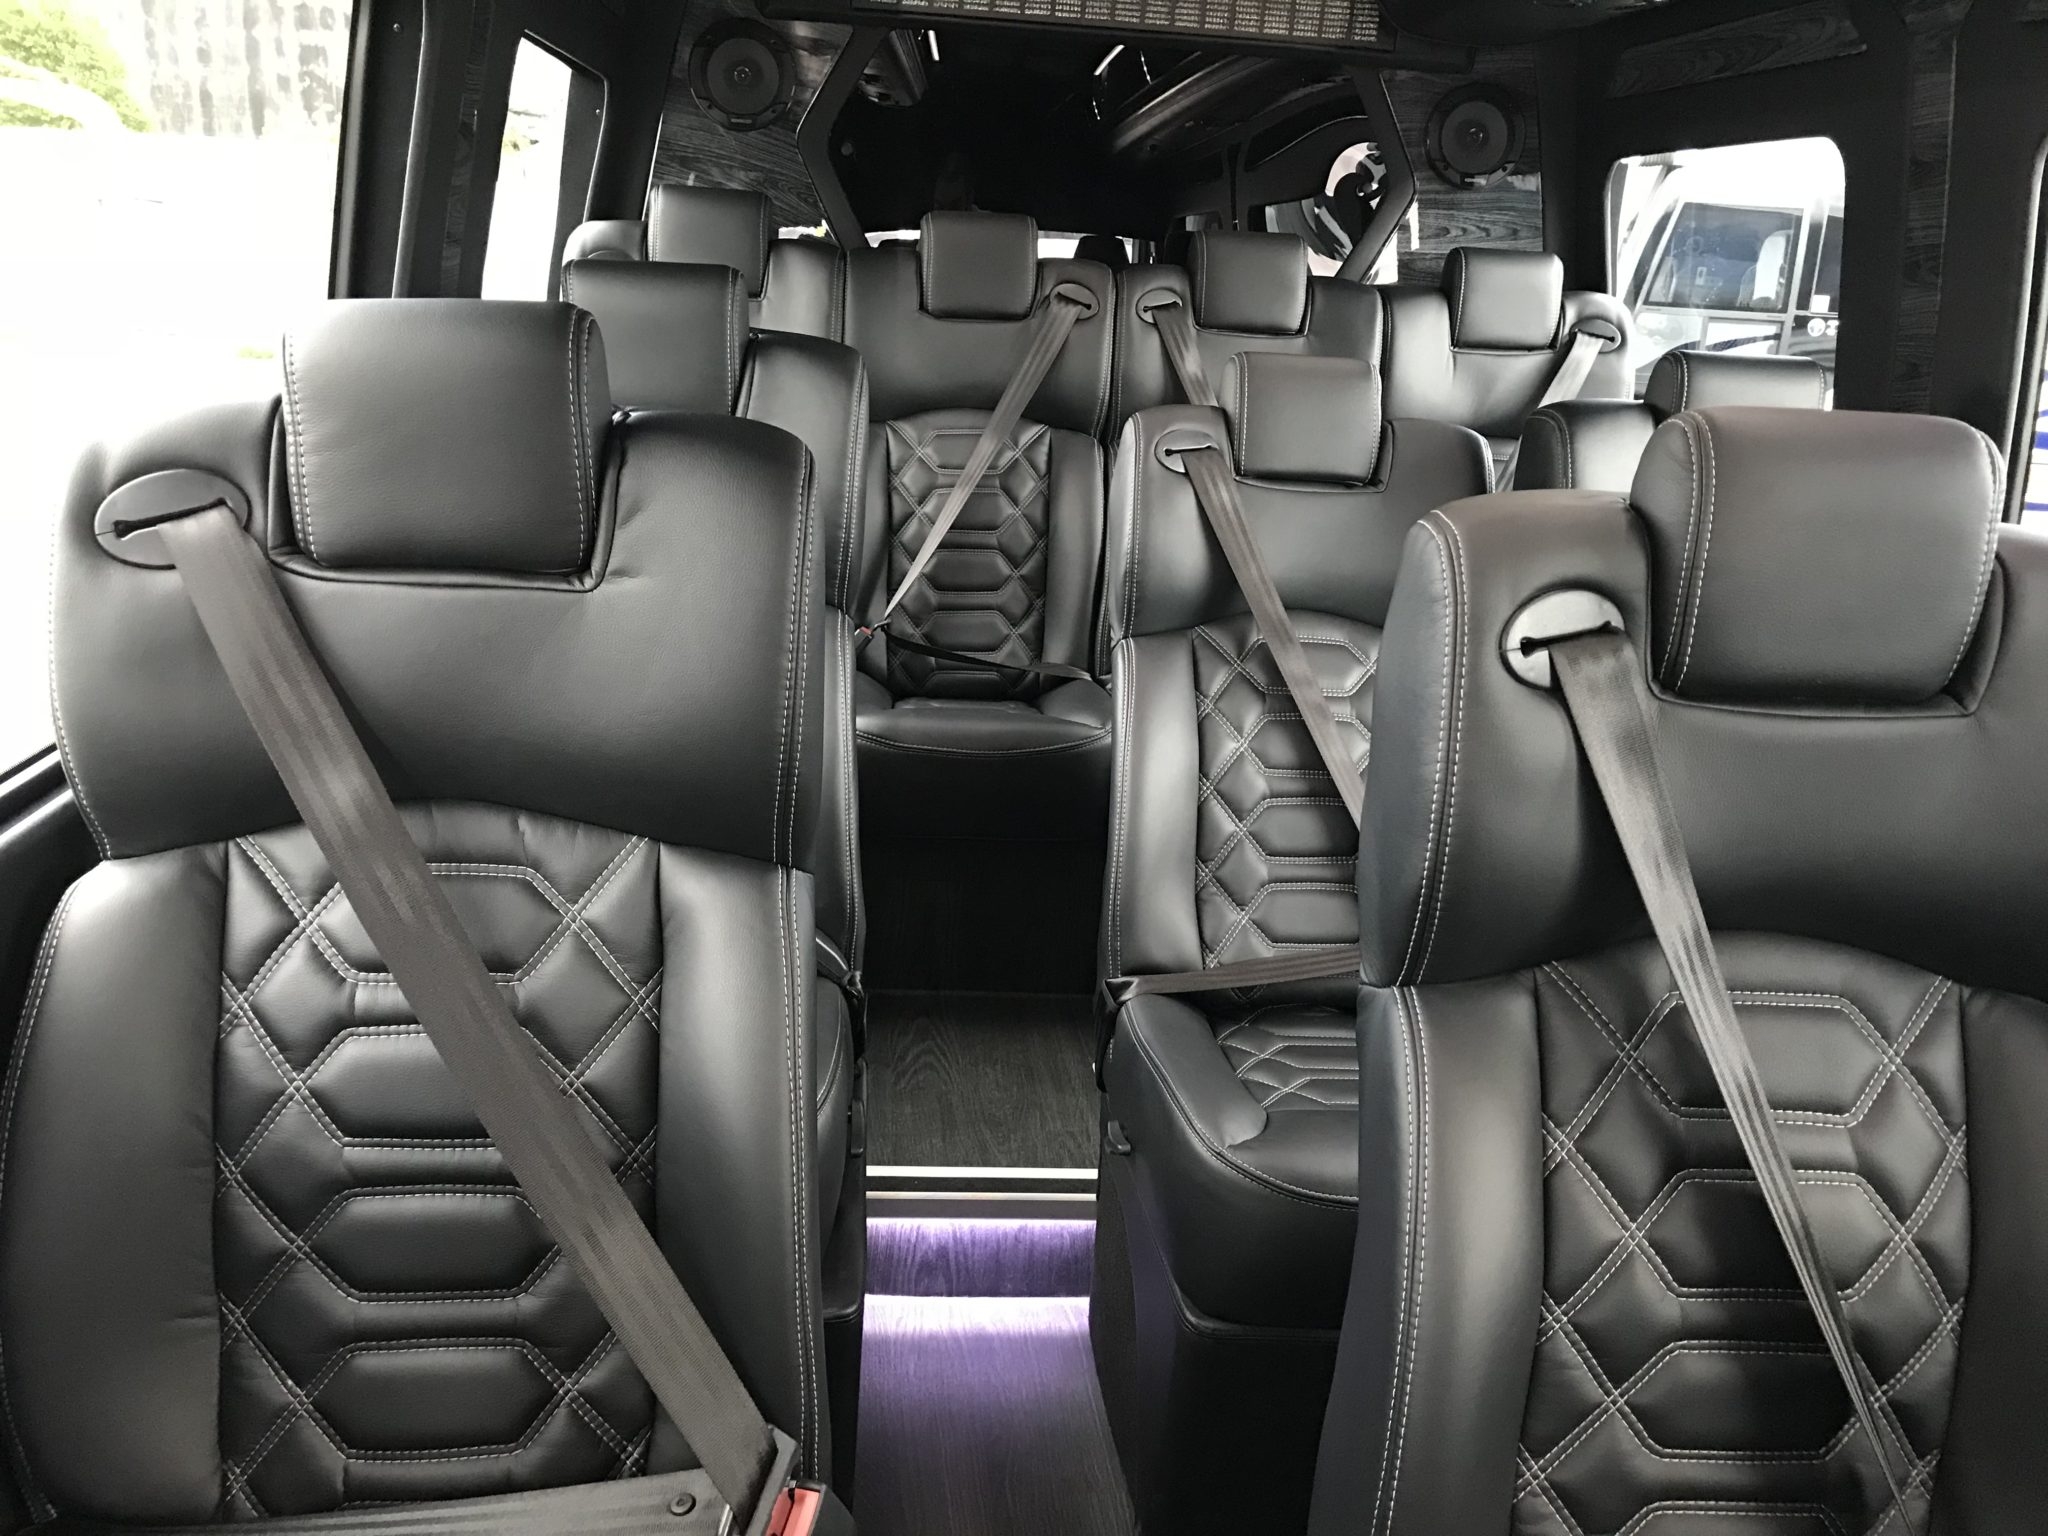 Mercedes-Benz Sprinter Vans: The Latest in Luxury Travel from Best Trails & Travel